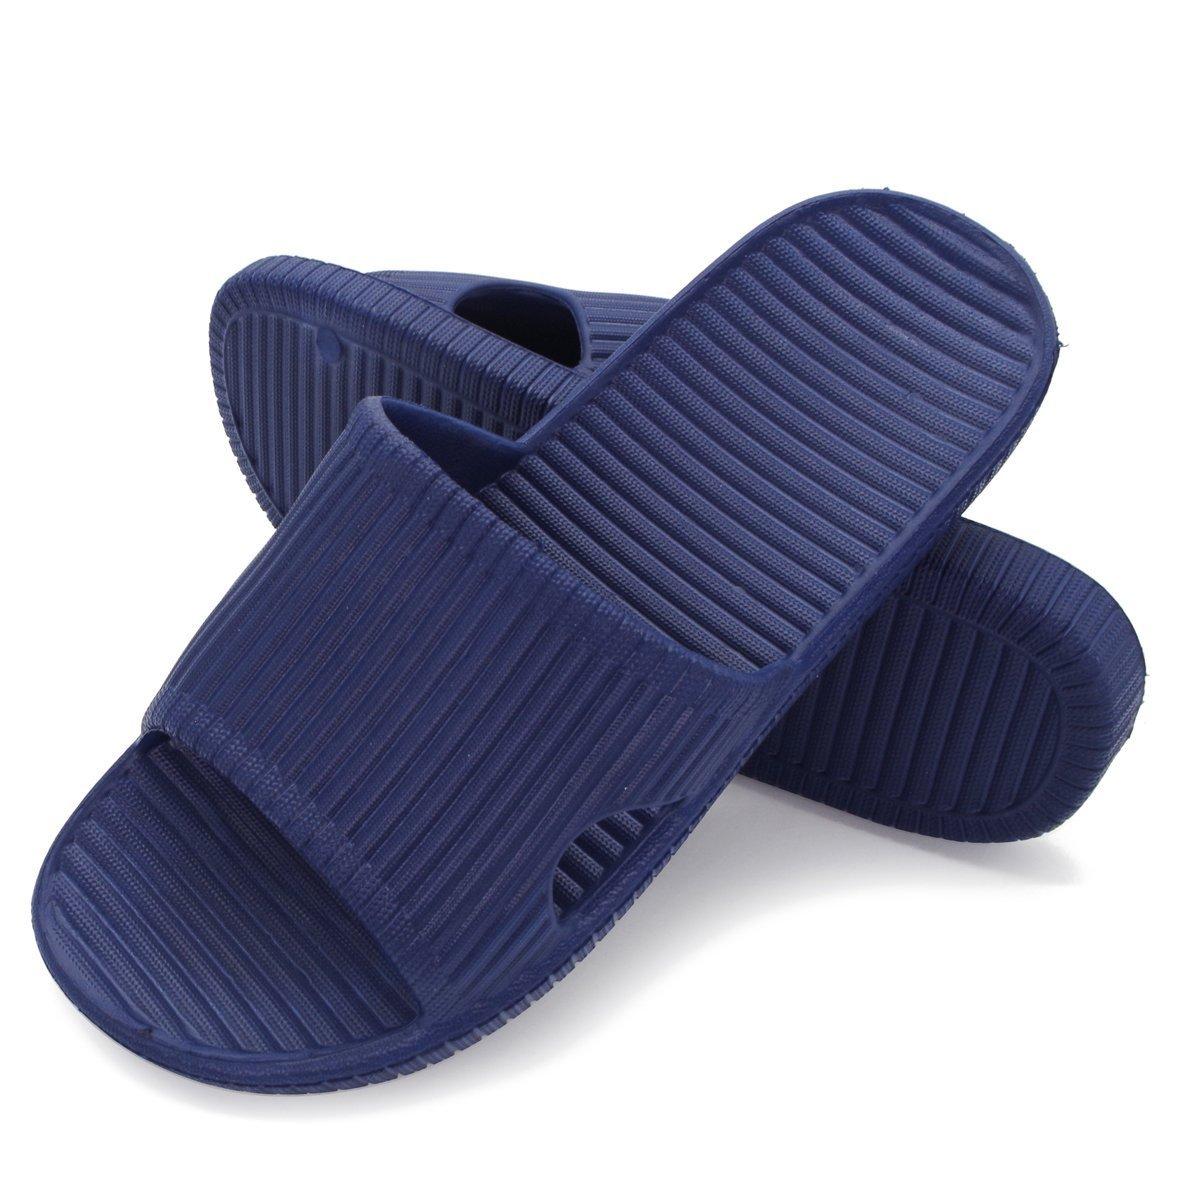 Qiucdzi Bathroom Shower Slippers Women's and Men's Summer Non Slip House Sandals Soft Pool Beach Shoes